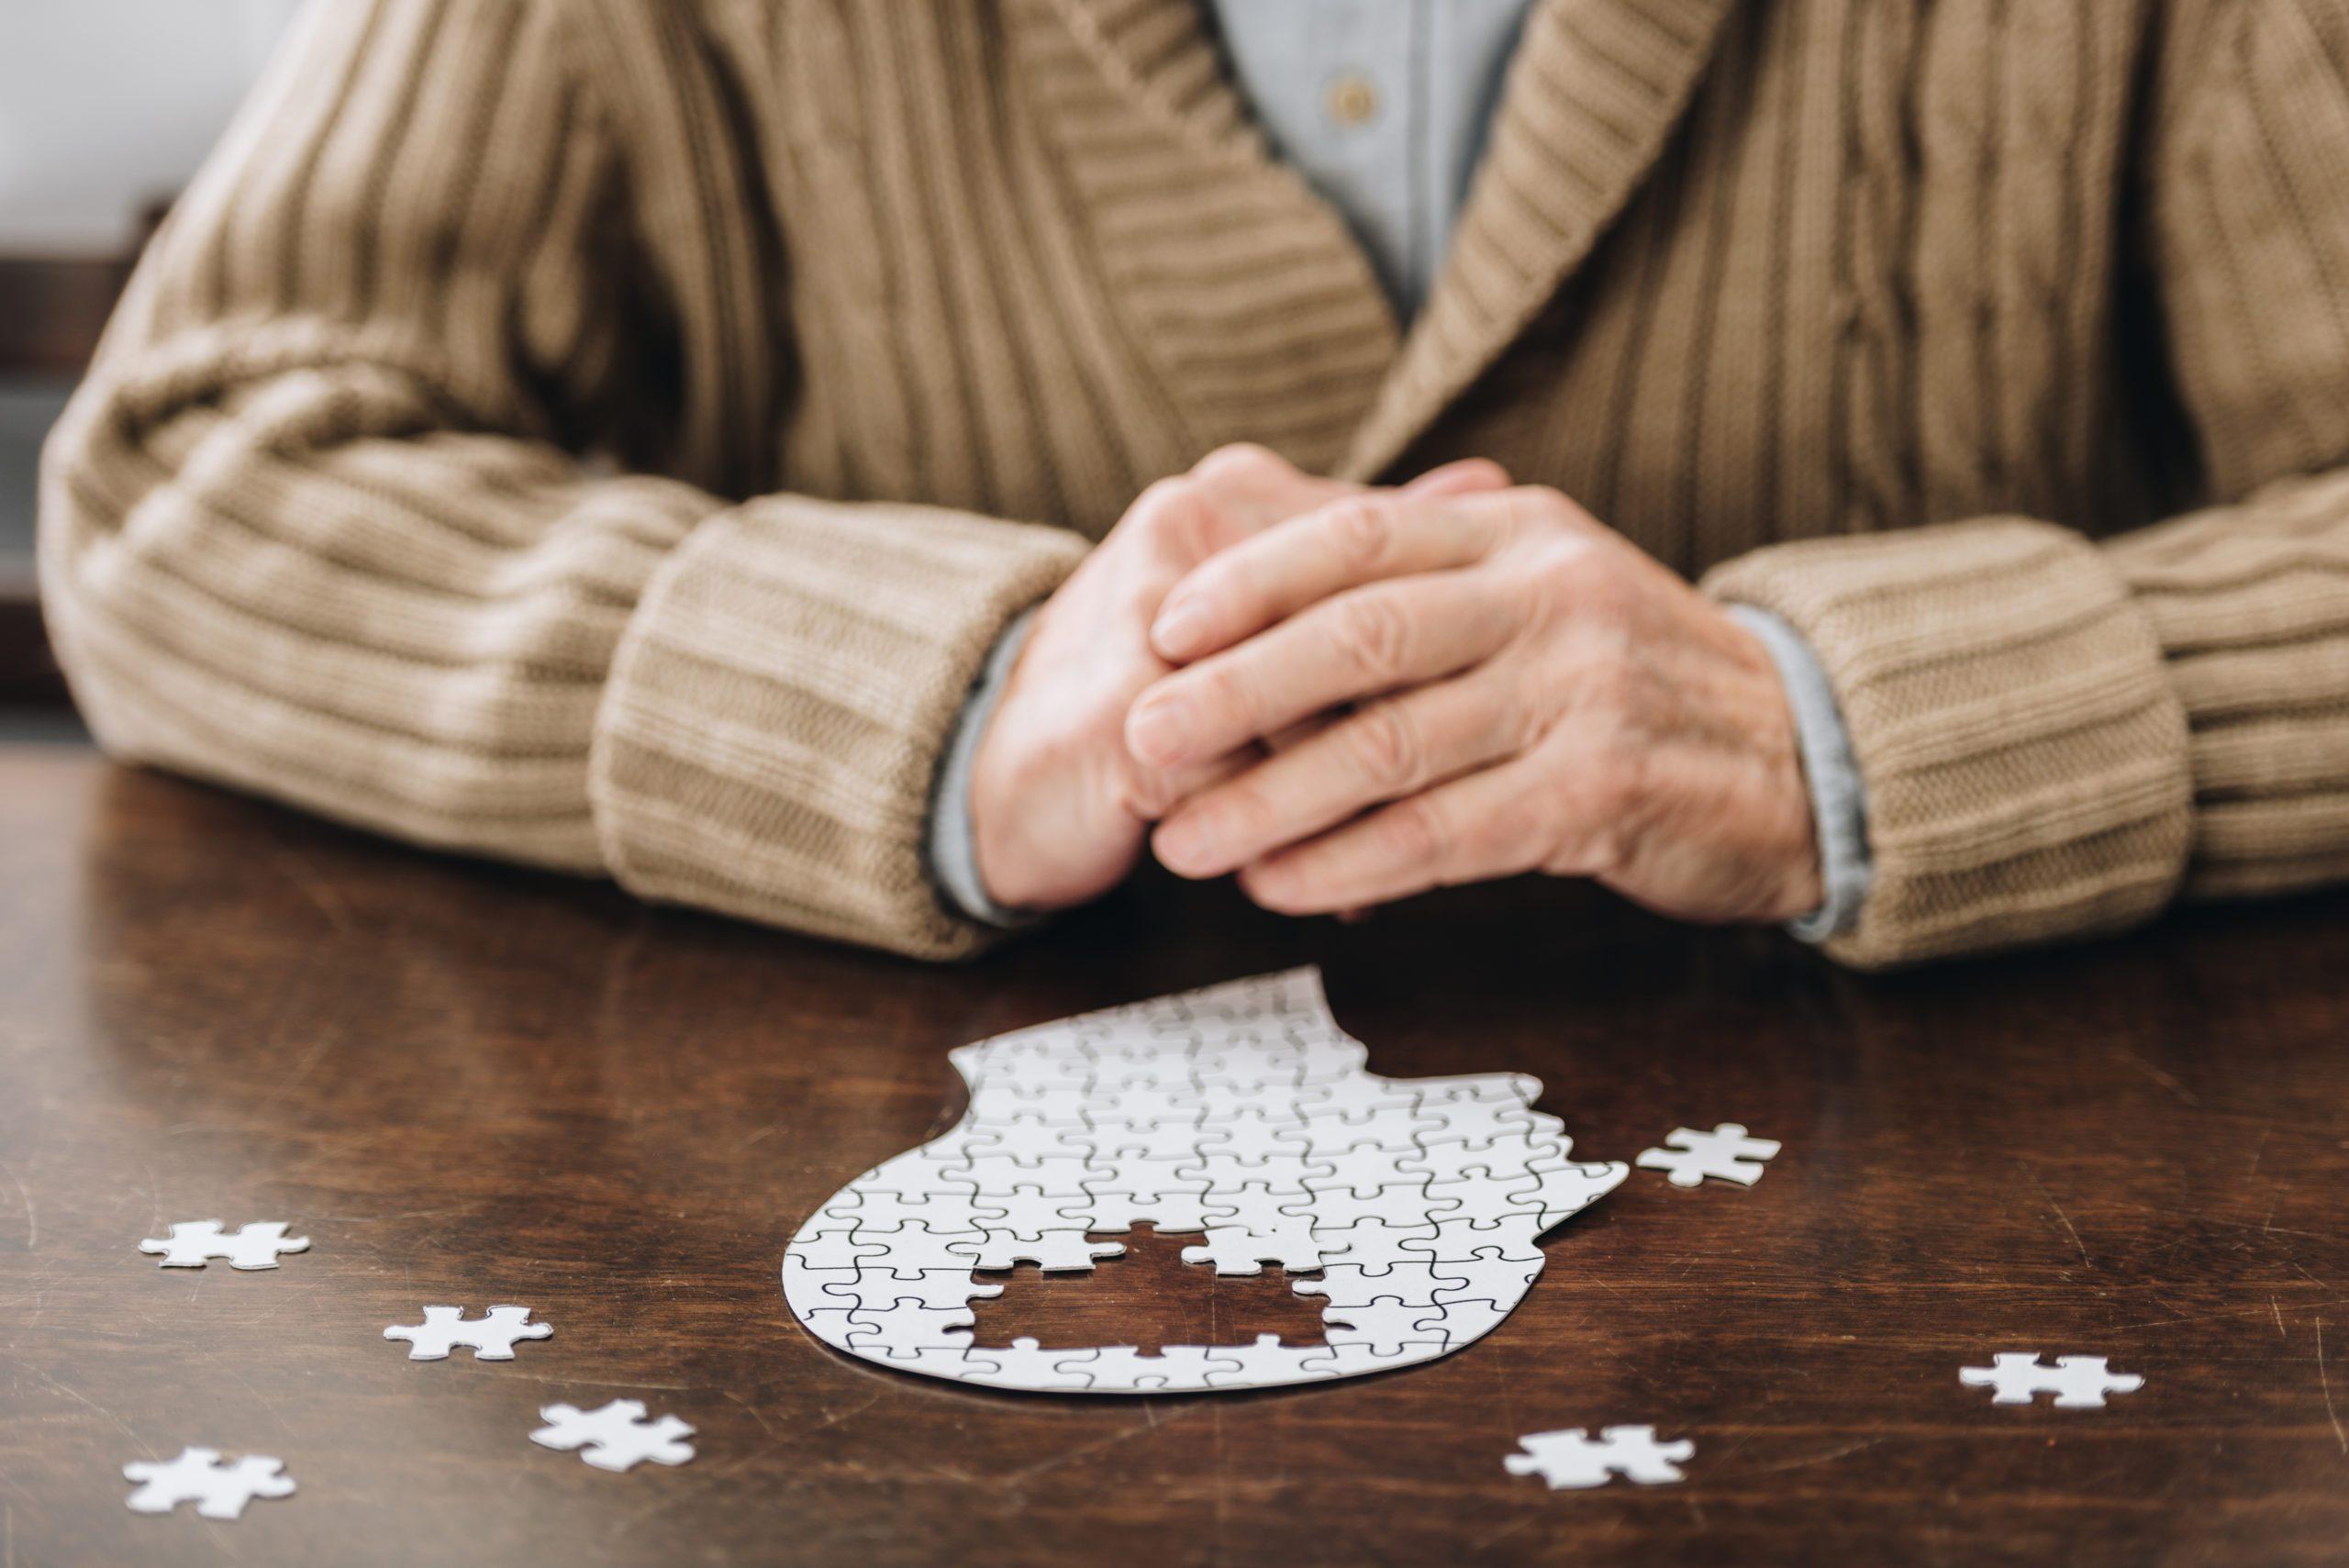 Predicting and Preventing Dementia